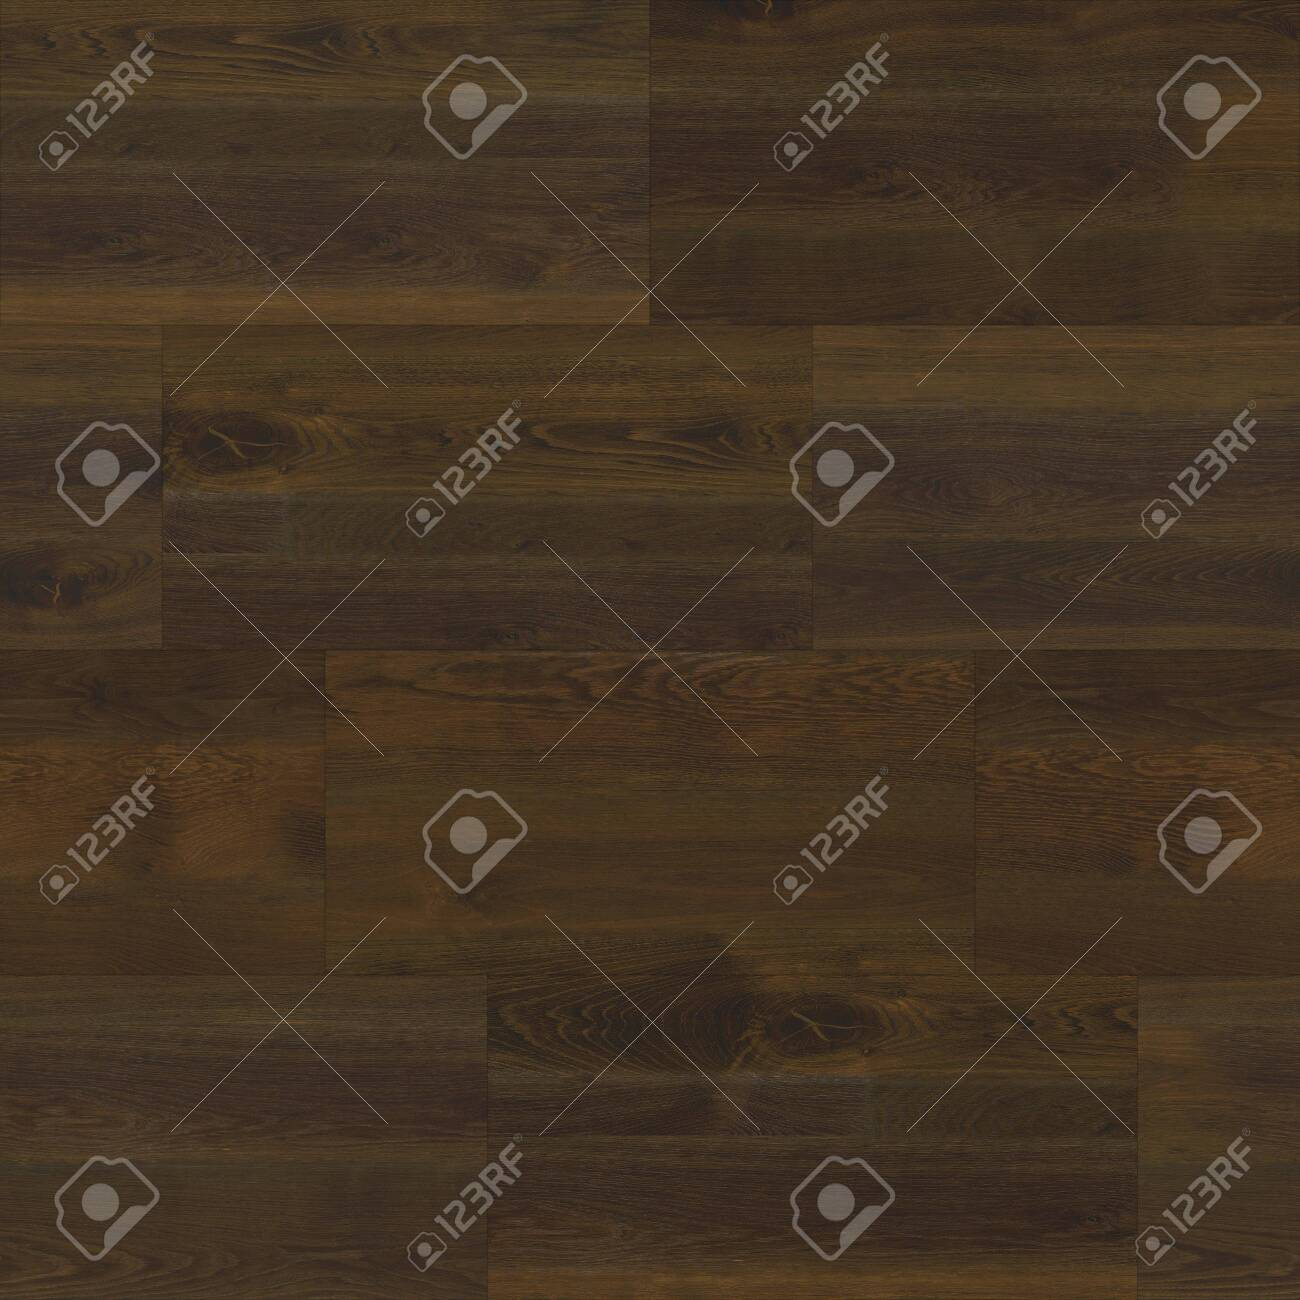 Seamless wood parquet texture linear dark brown - 126240188